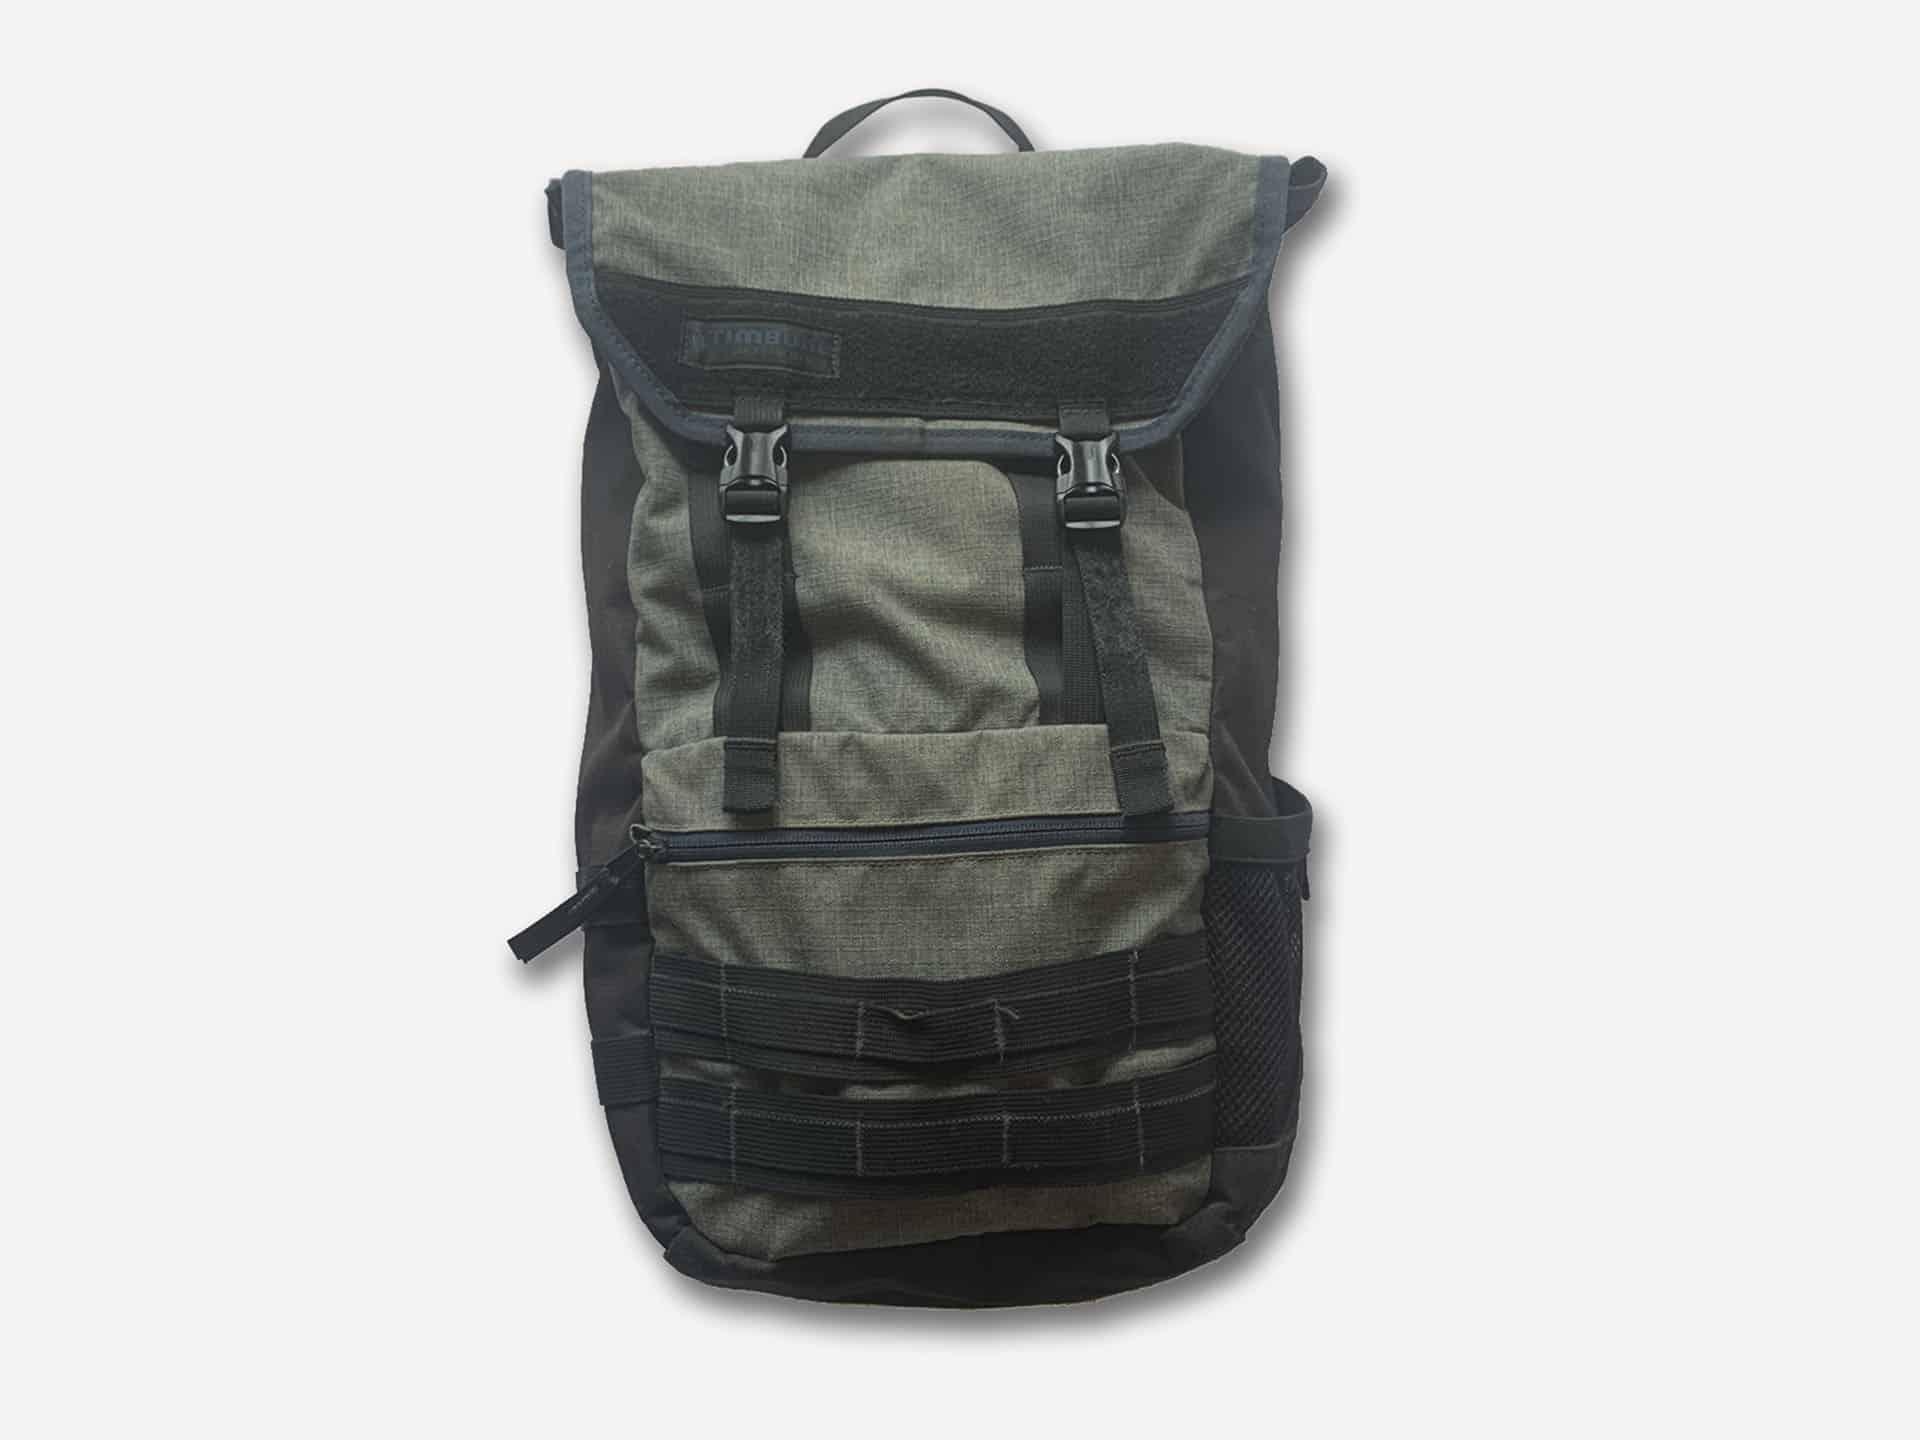 Timbuktu Backpack - Travel Essentials List